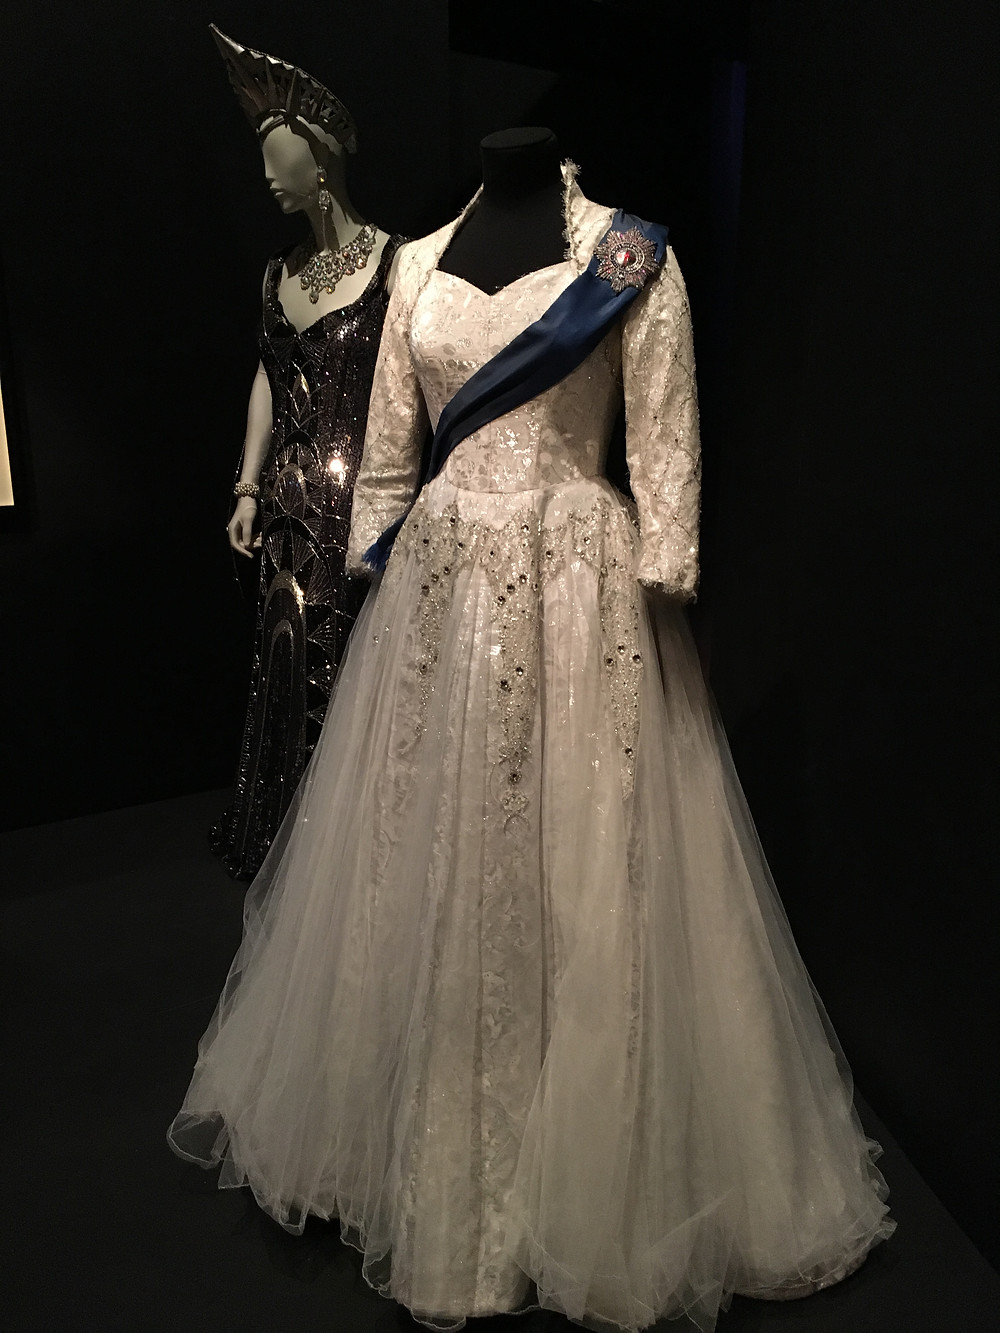 Helen Mirren's dress from The Audience